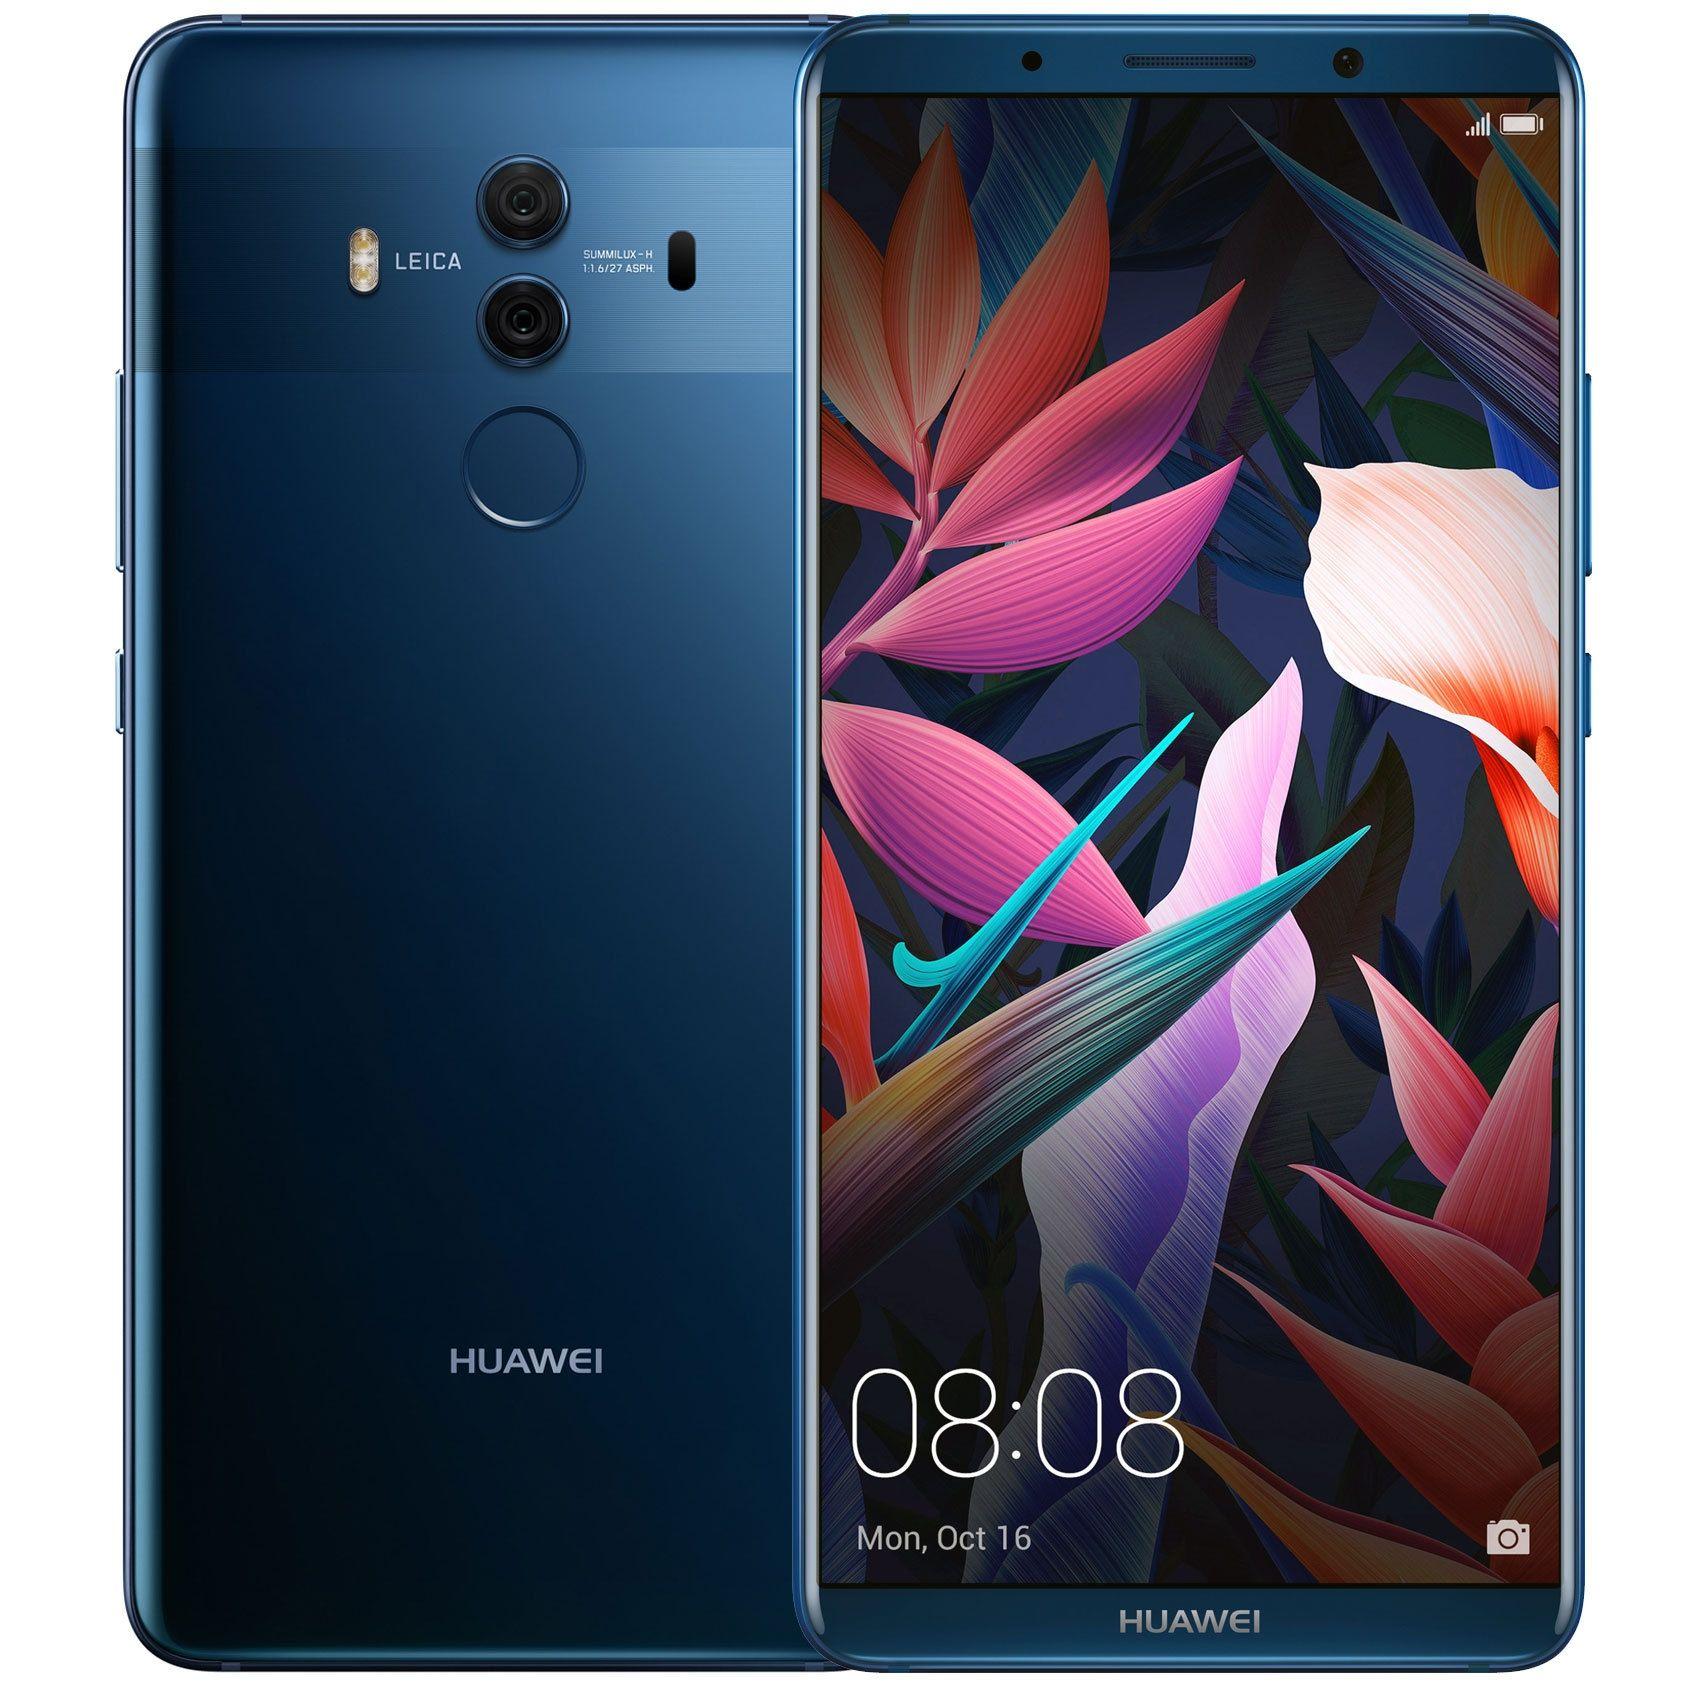 Huawei Mate 10 Pro 6 Fhd 1080x2160 128gb Kirin 970 S Izkustven Intelekt Dual Sim Sin Phones For Sale Android Phone Huawei